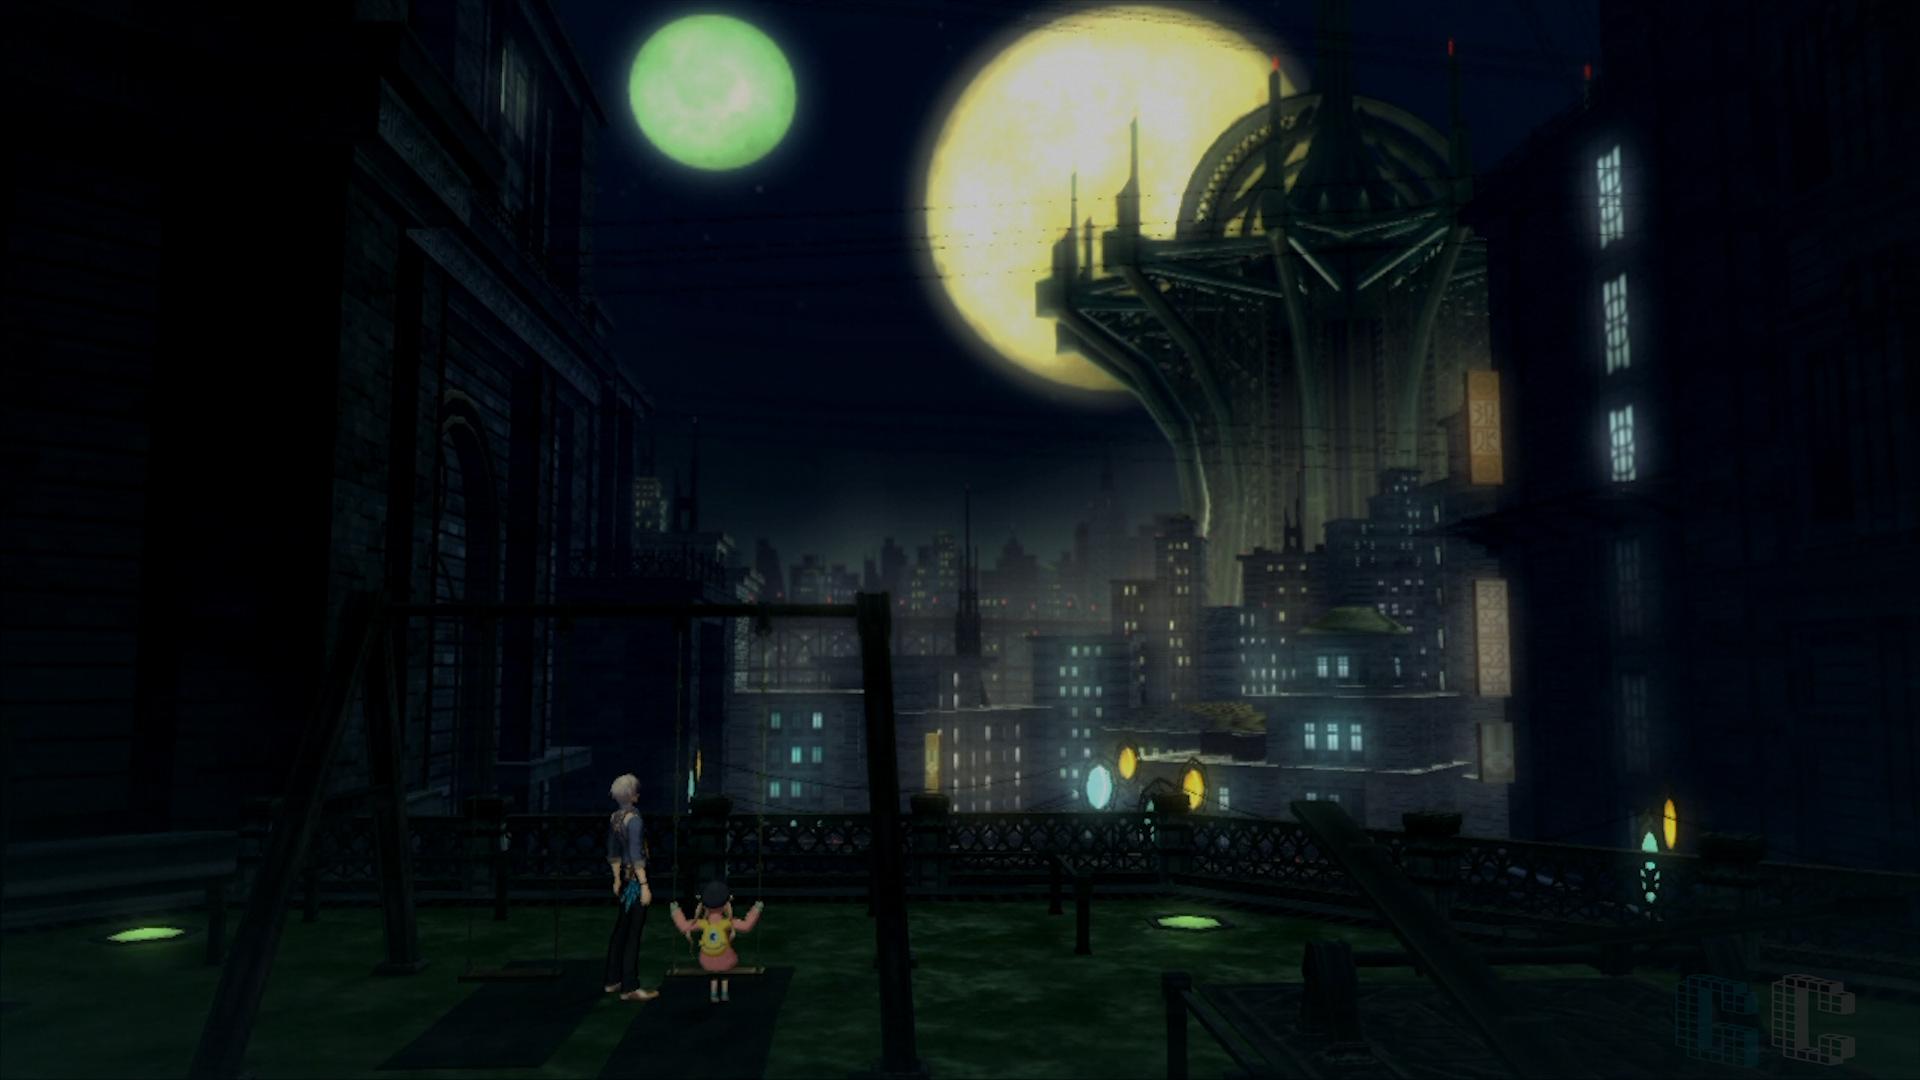 Tales of Xillia 2 Same world